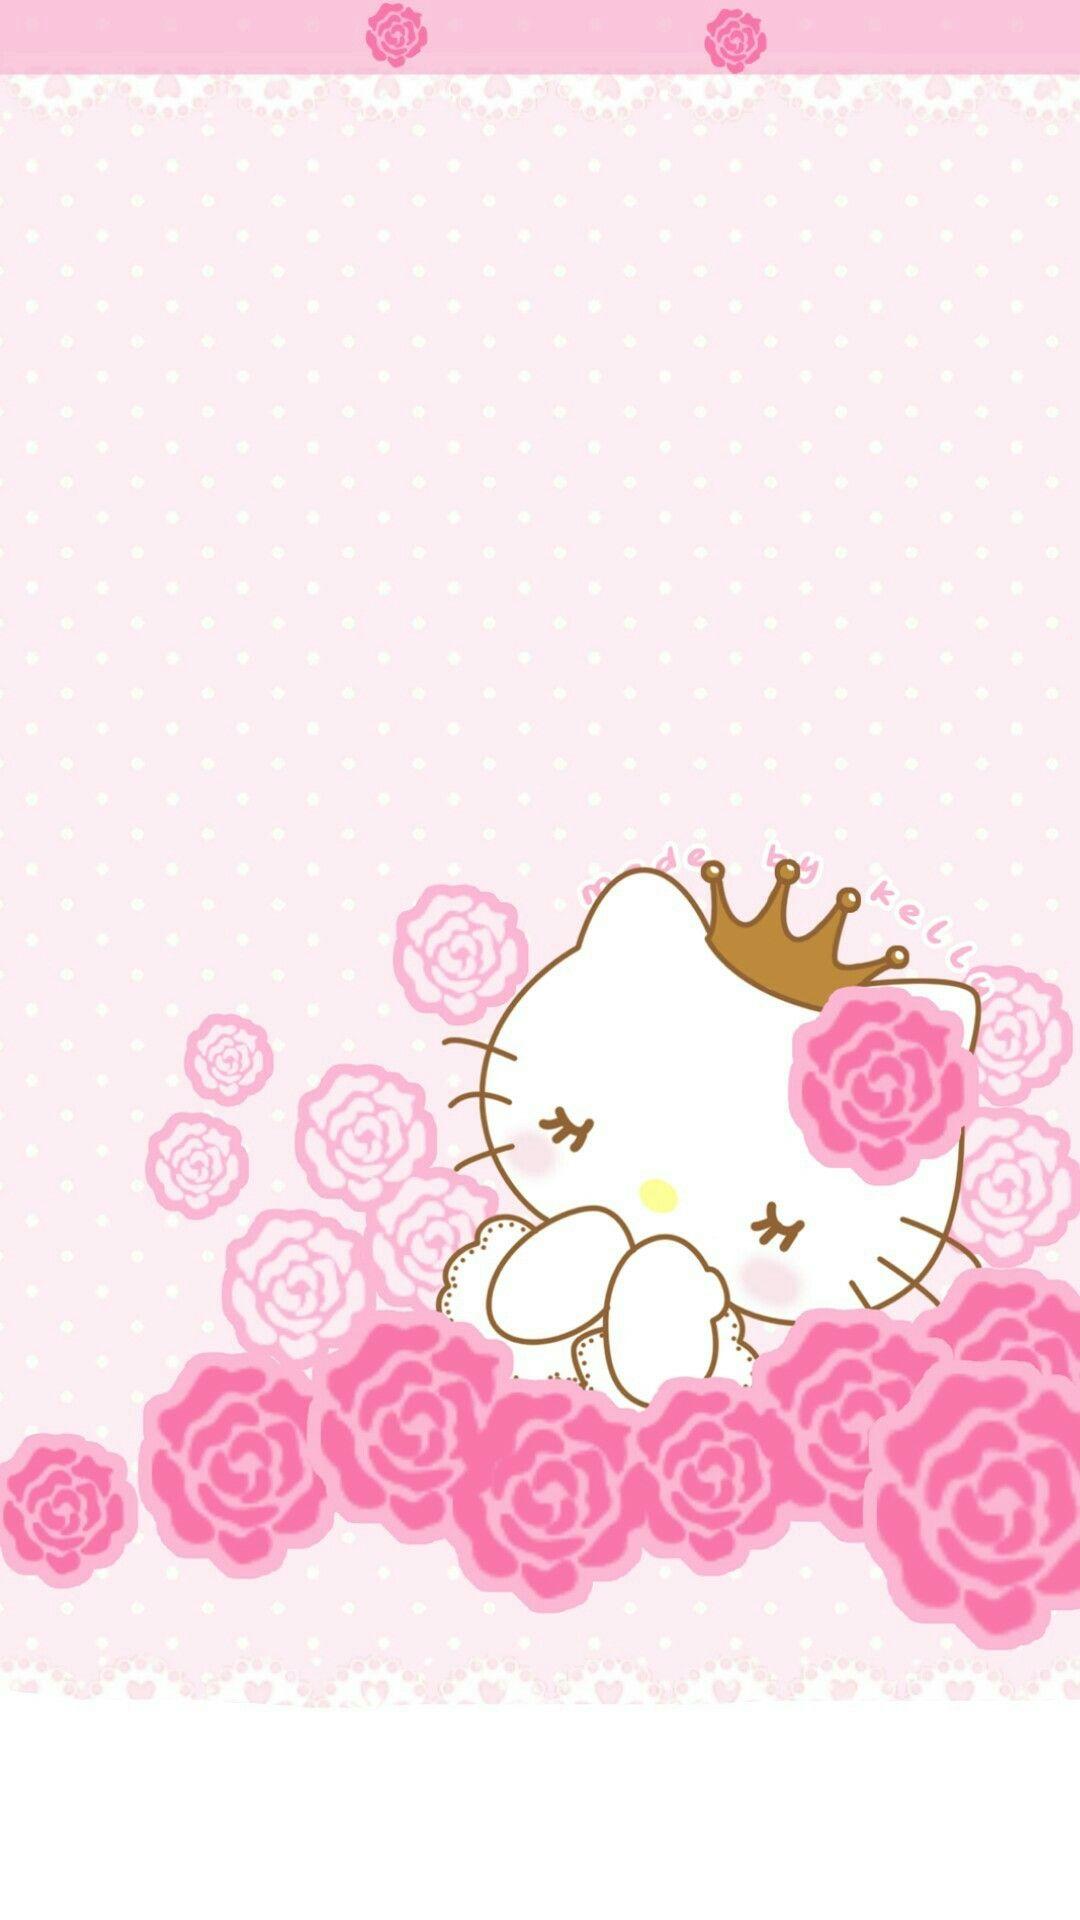 Fantastic Wallpaper Hello Kitty Sakura - bea56836f21b8102794f1fc9e6e5825a  Gallery_16398.jpg